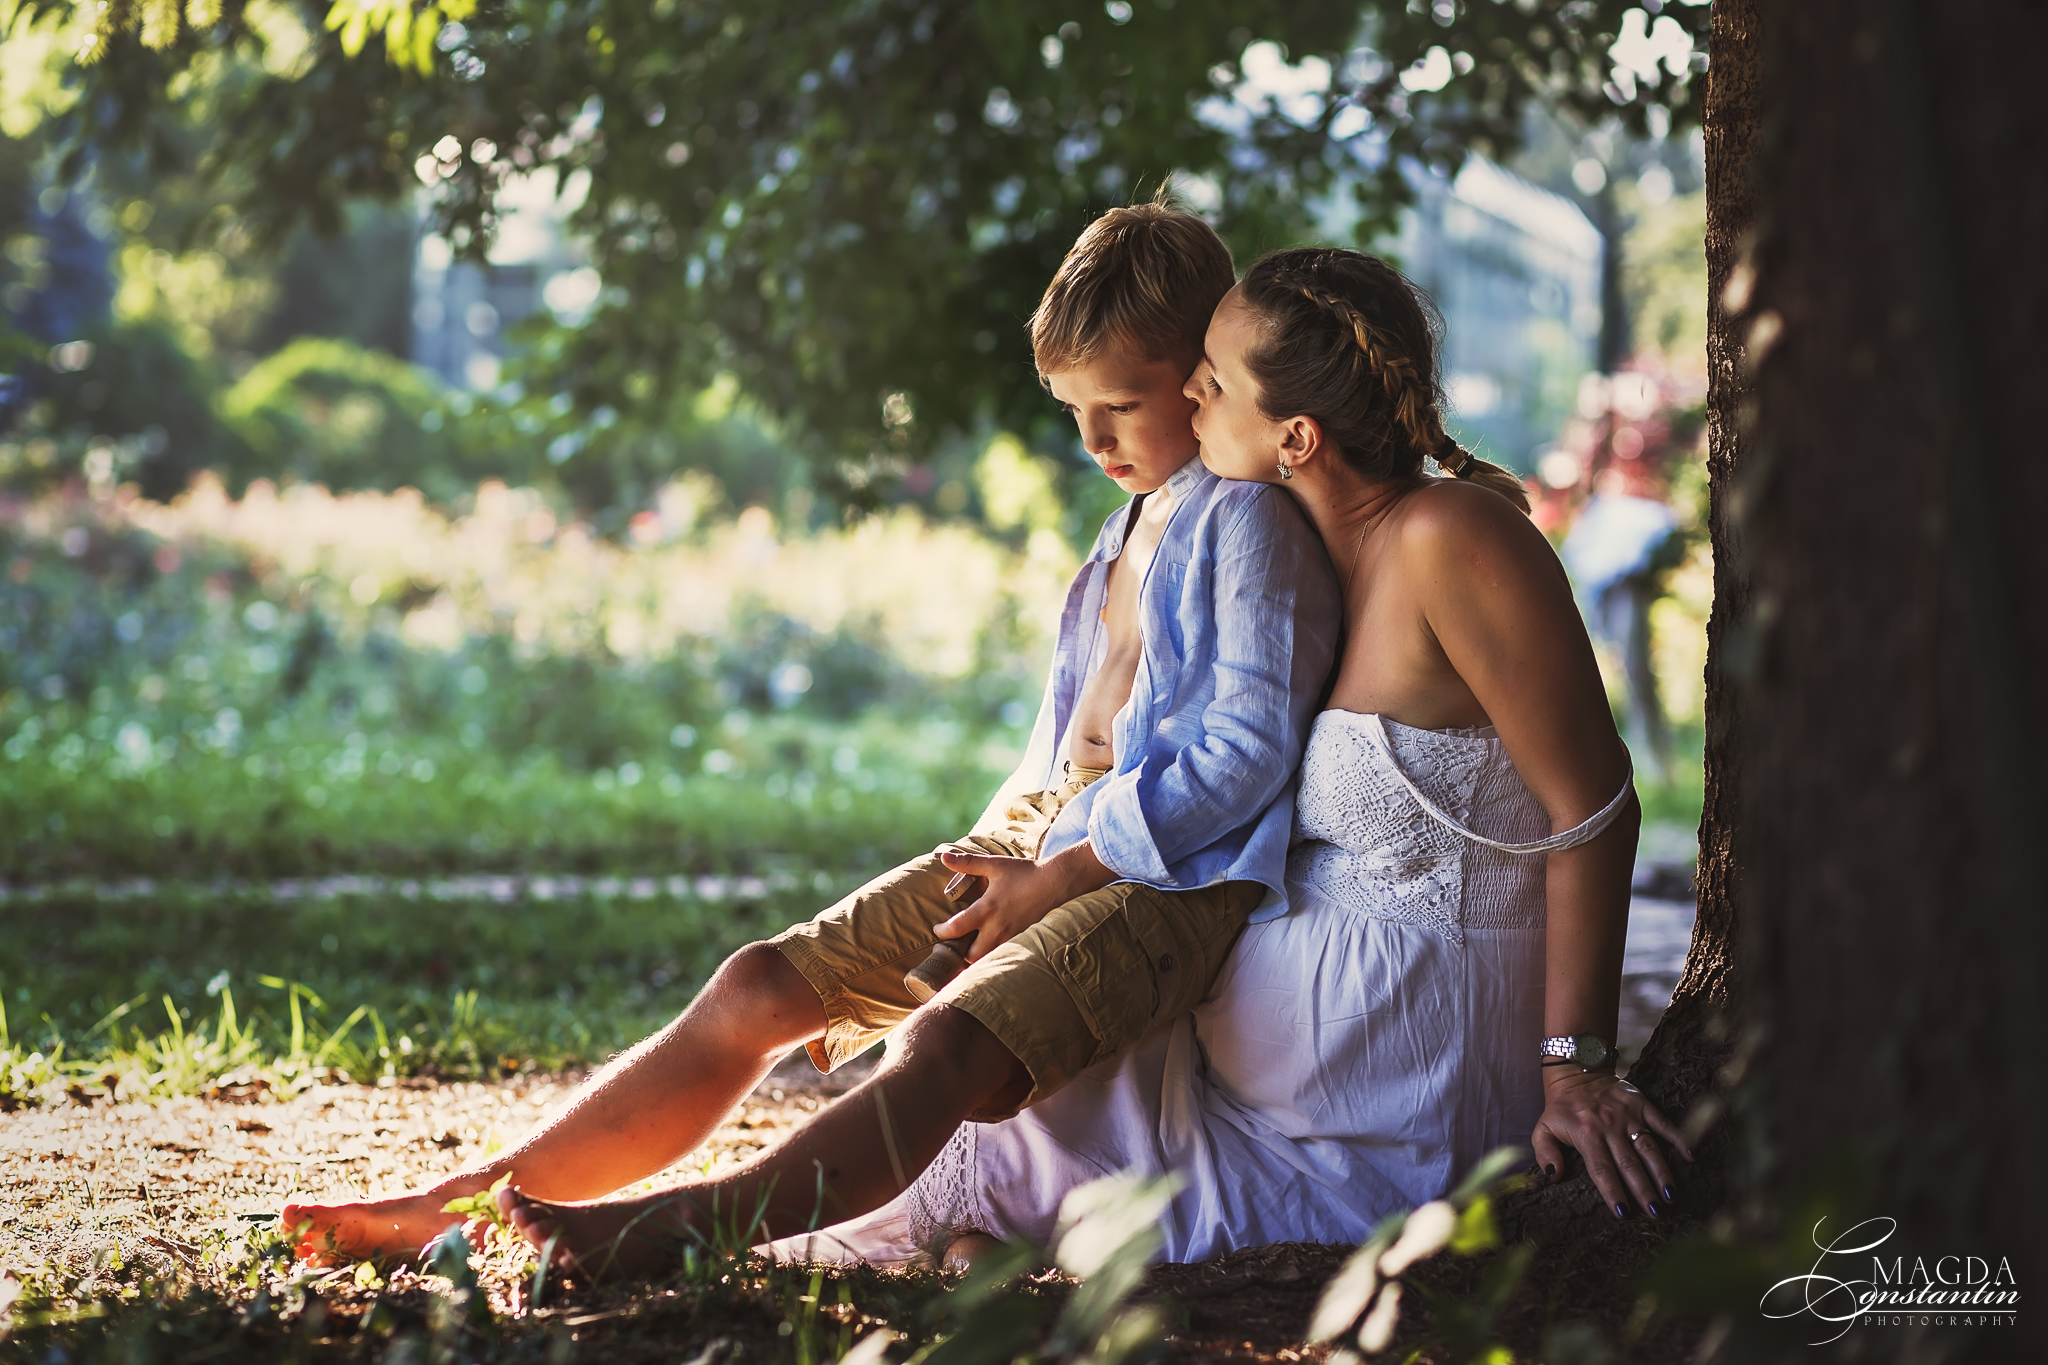 Sedinta foto de maternitate in natura cu stefania si baiatul ei cel mare asezati sprijiniti de copac in gradina botanica